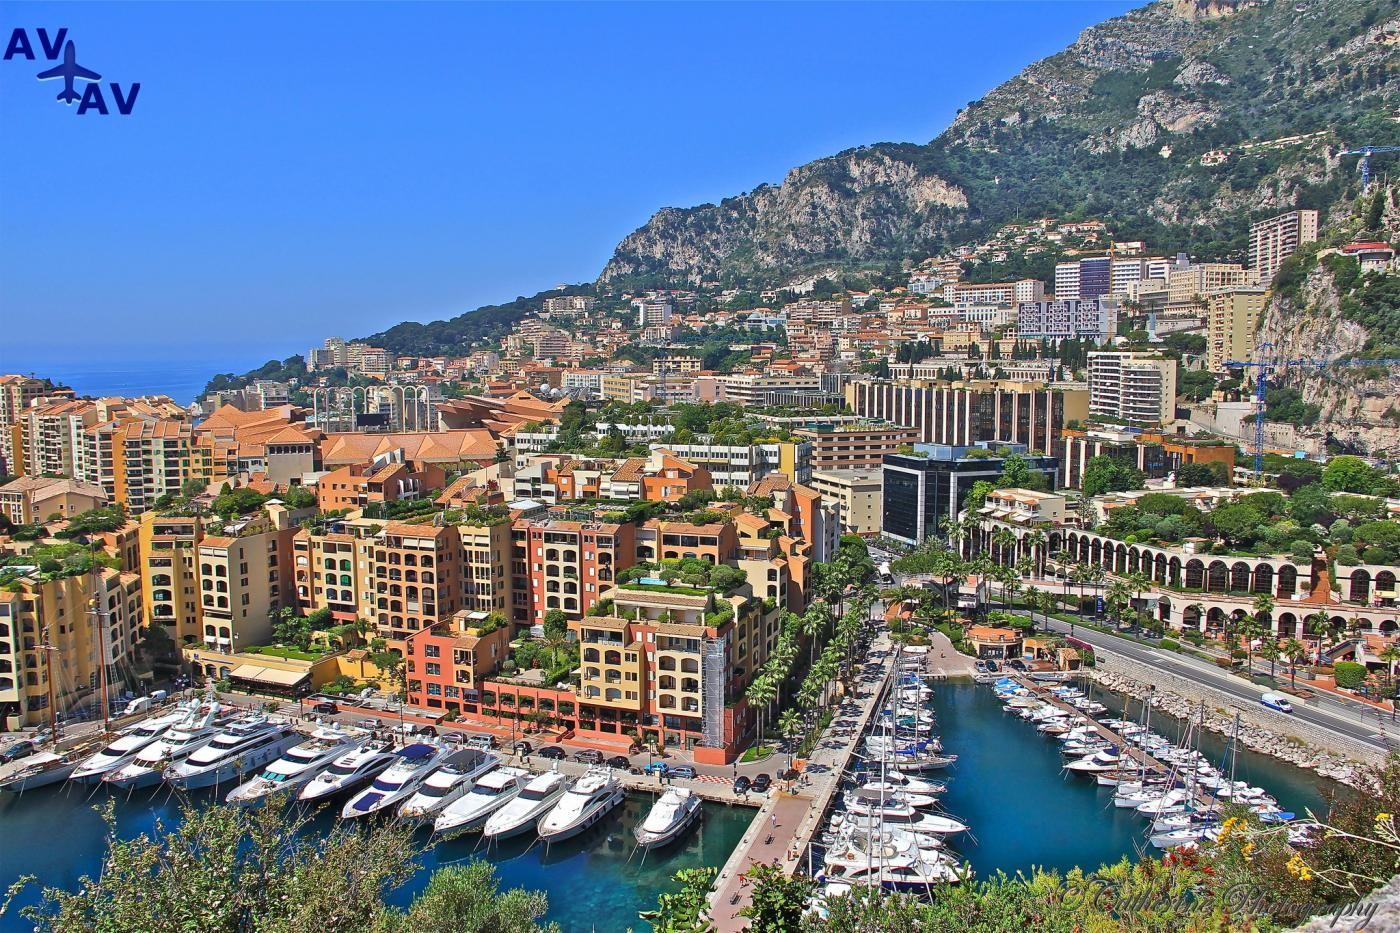 Osobyie chertyi Monako - Монако - искусство жизни